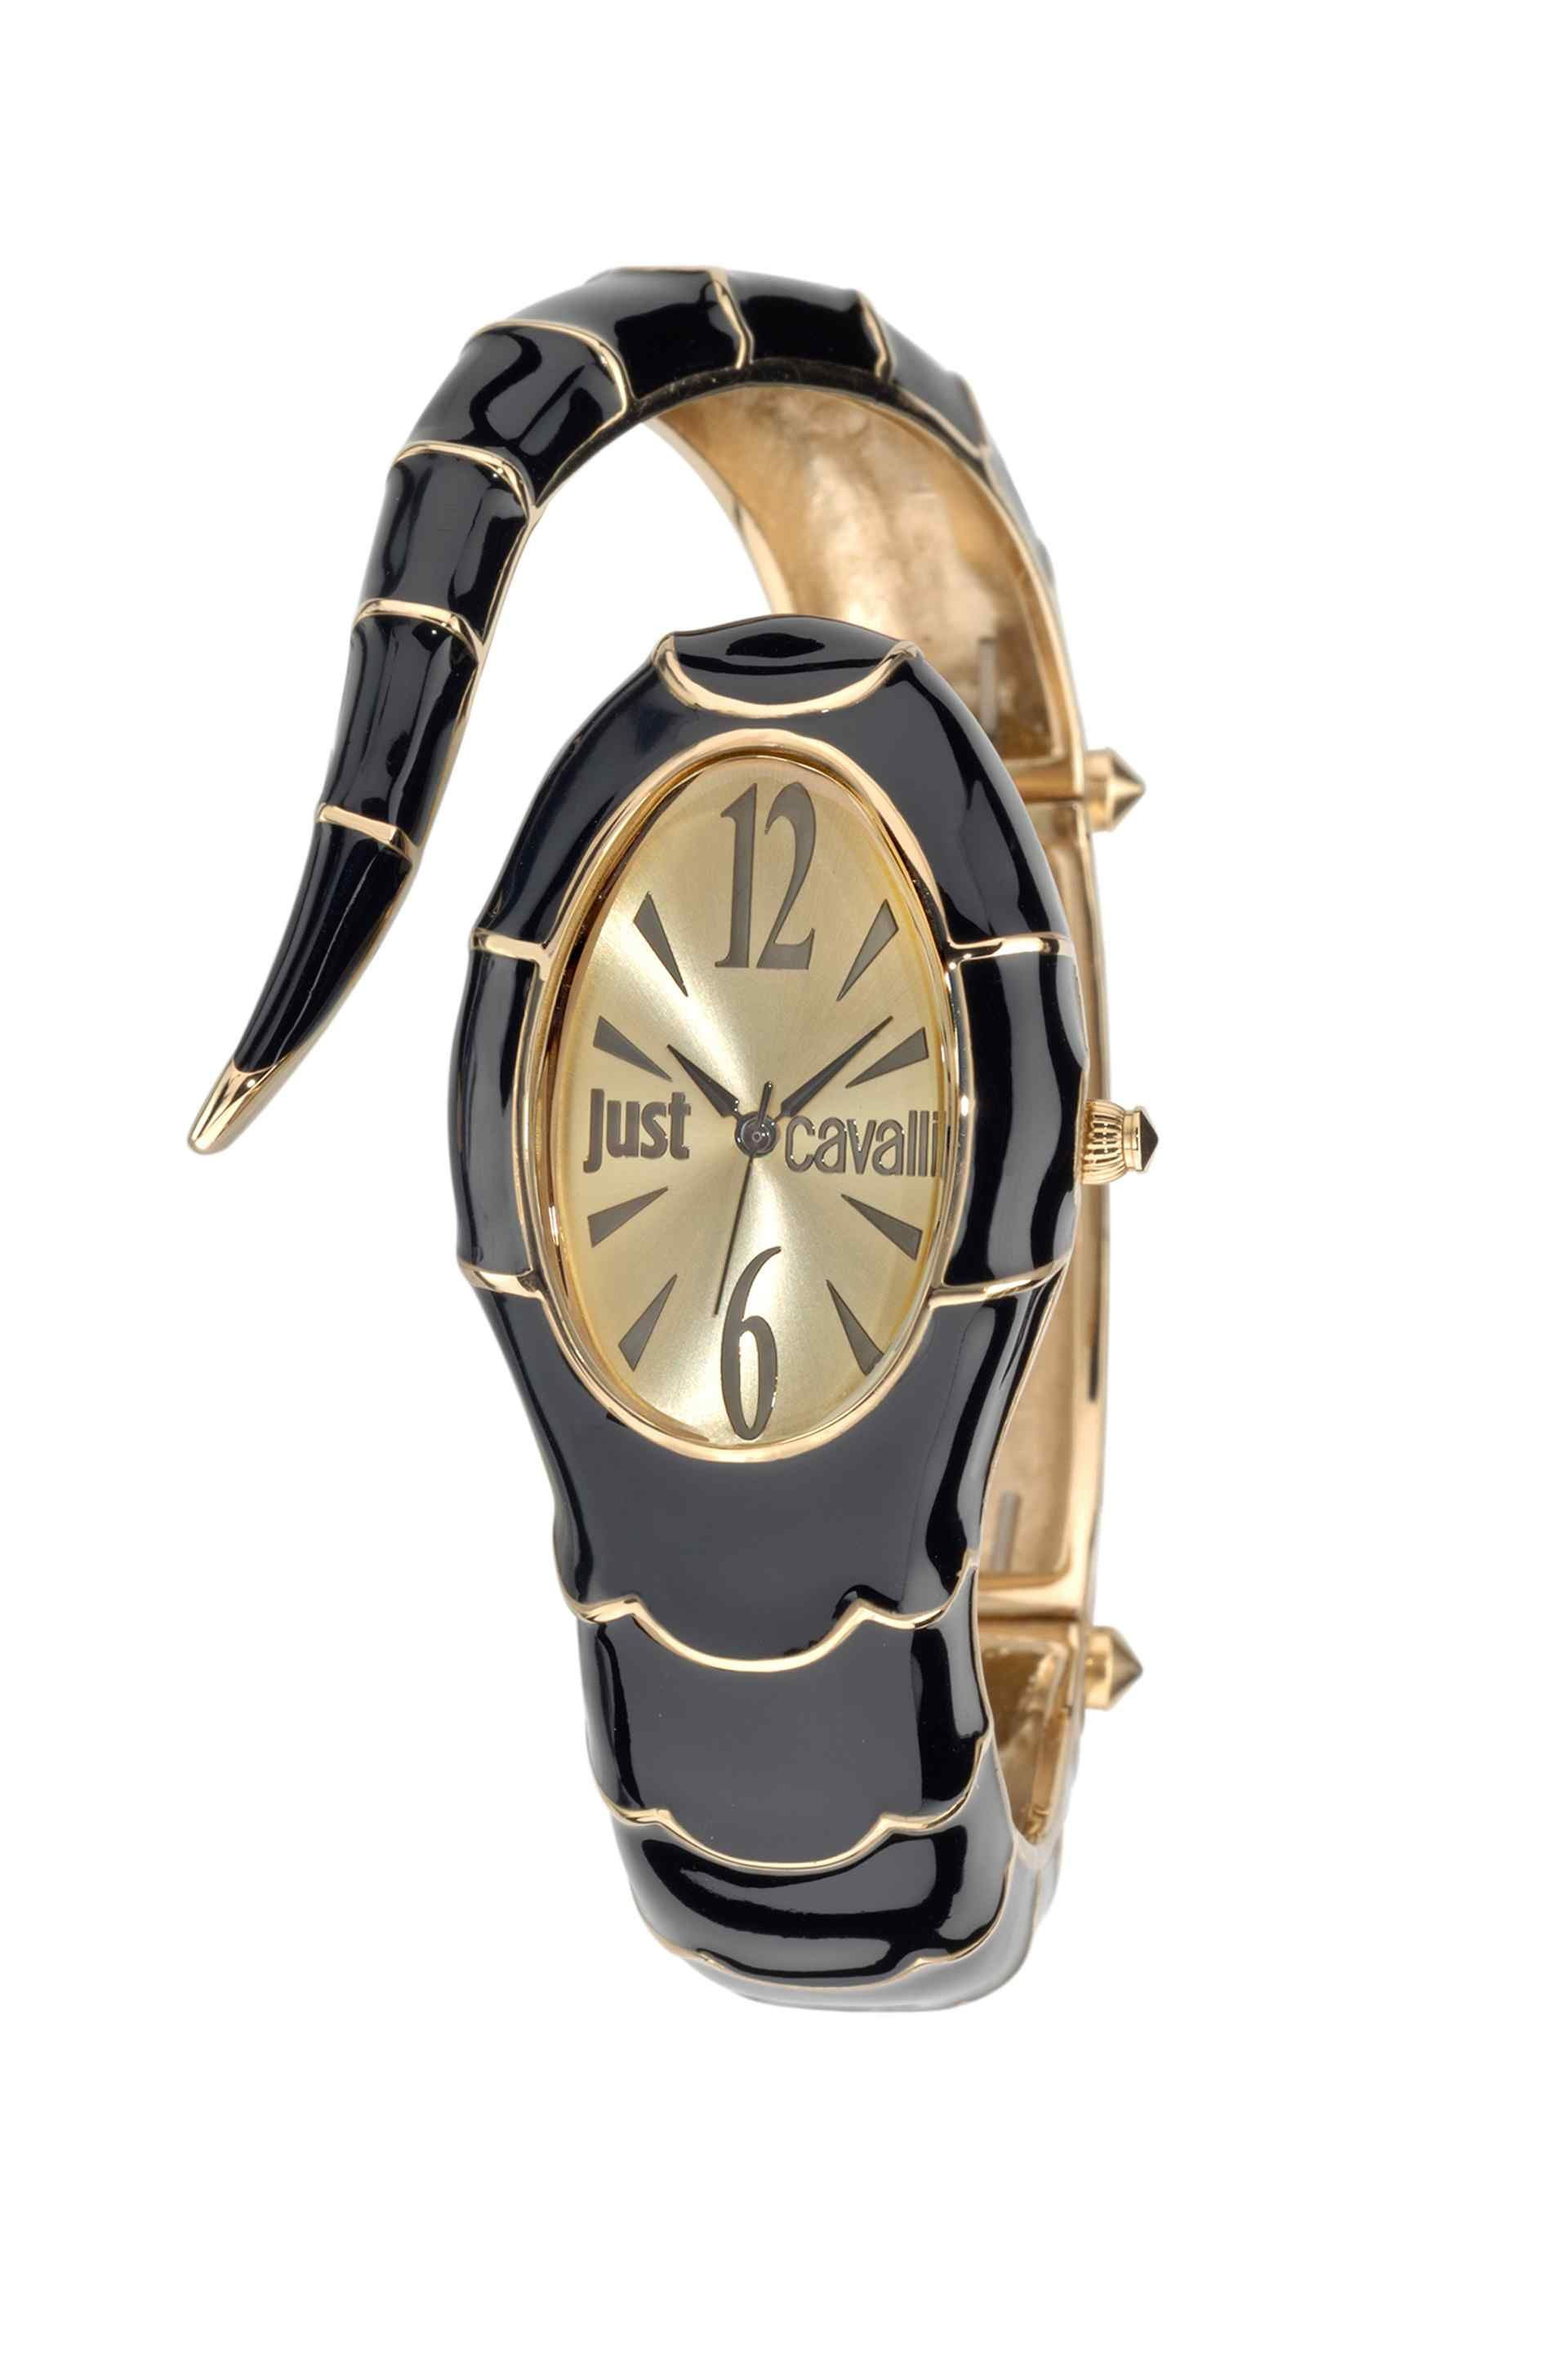 Degisik Saat Modelleri Bayan Saatleri Moda Watches